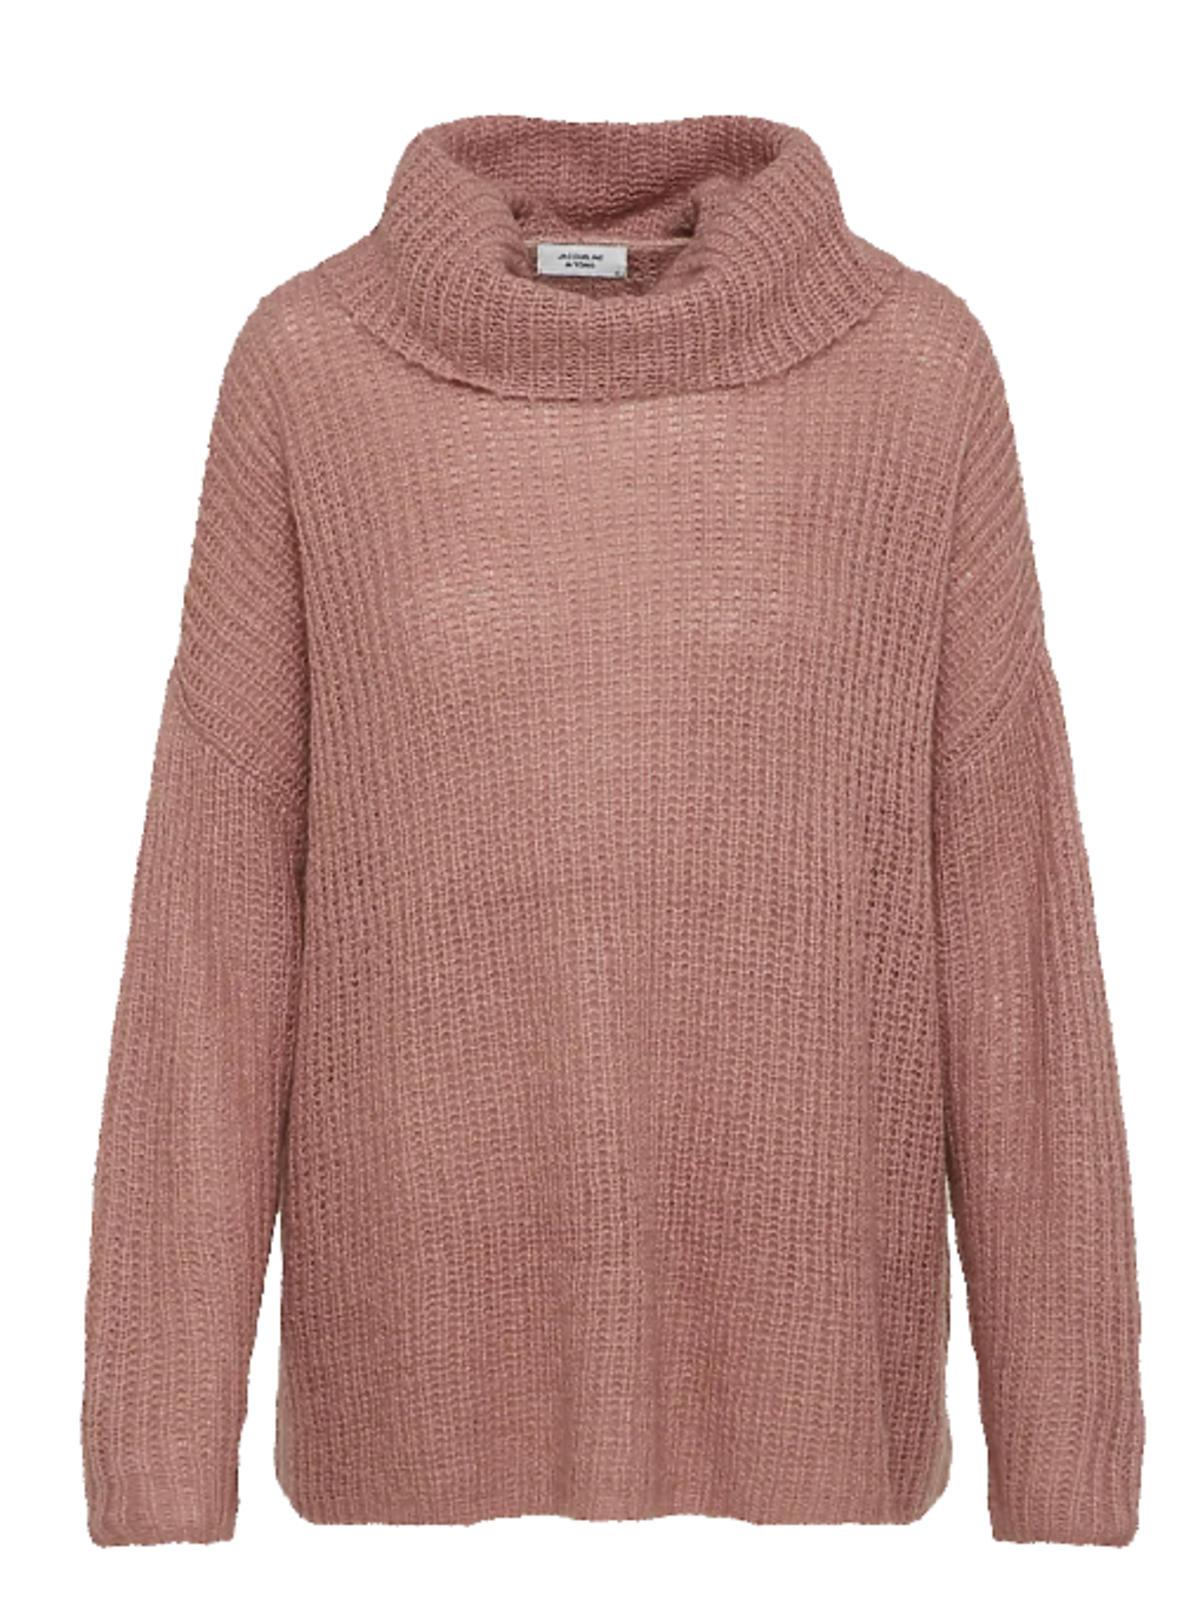 Sweter, Jaqueline de Tong 92 zł